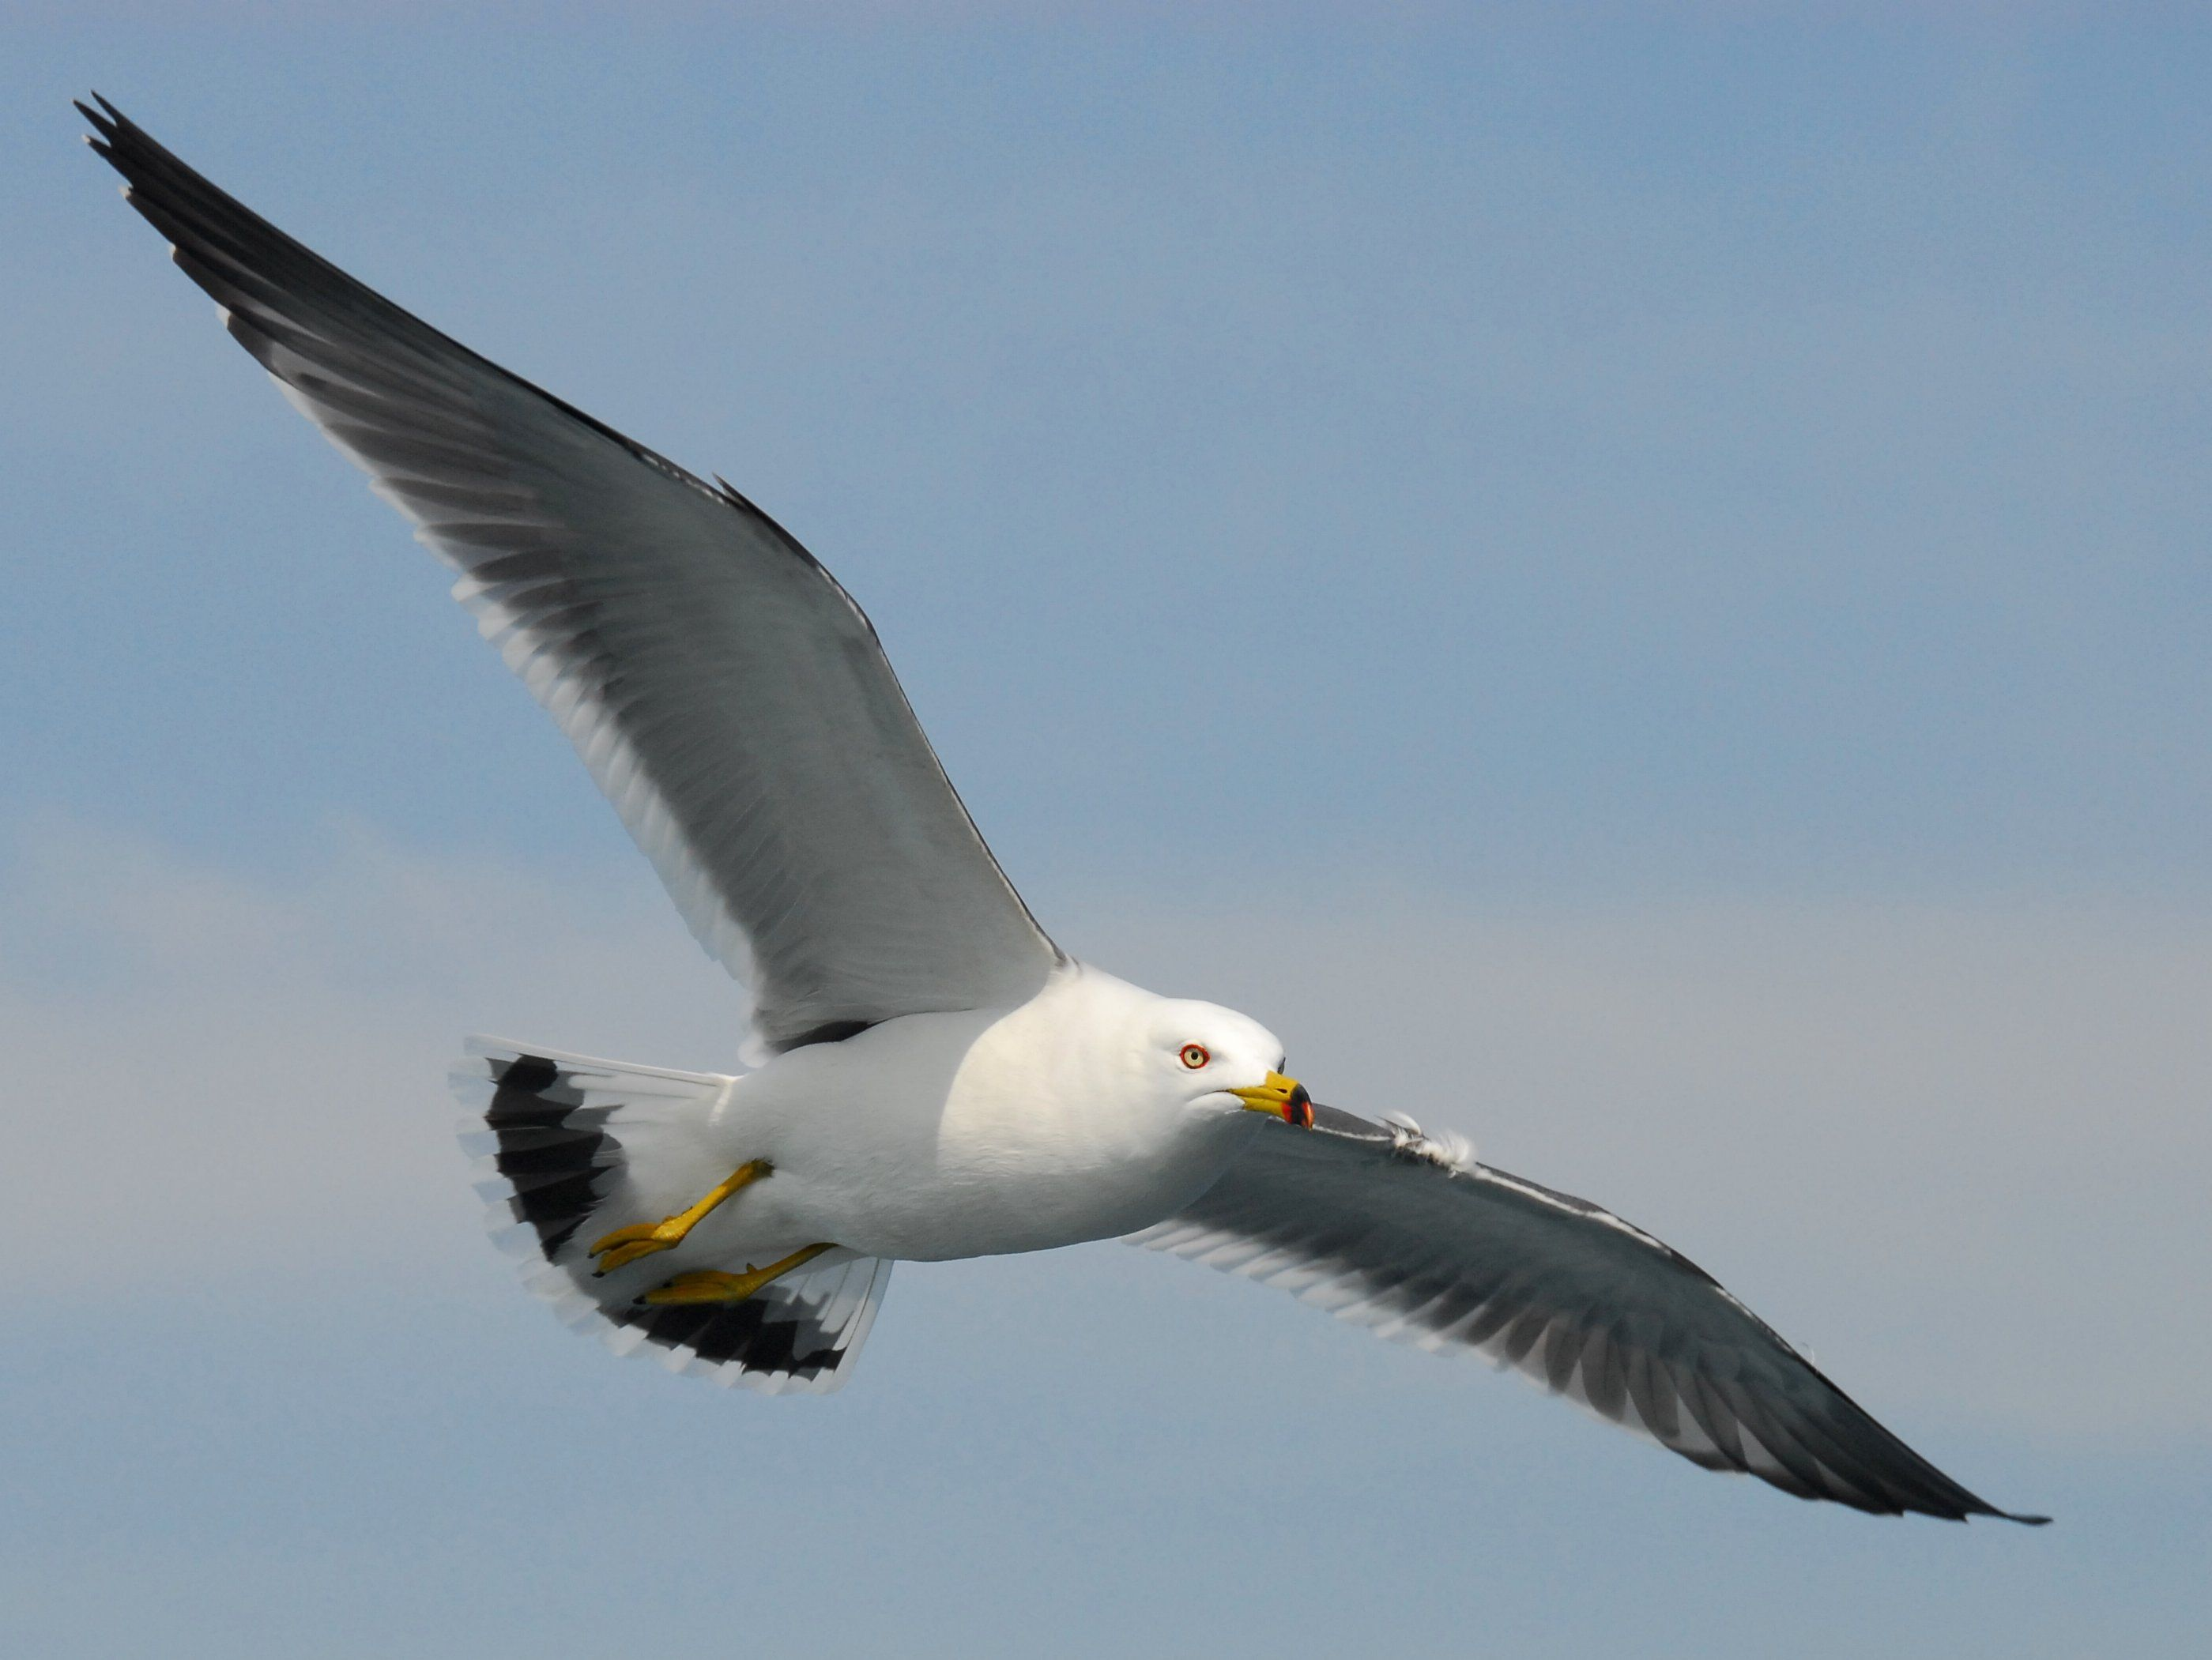 Black Tailed Gull Jpg 2799 2101 Fliegende Vogel Mauersegler Vogel Im Flug